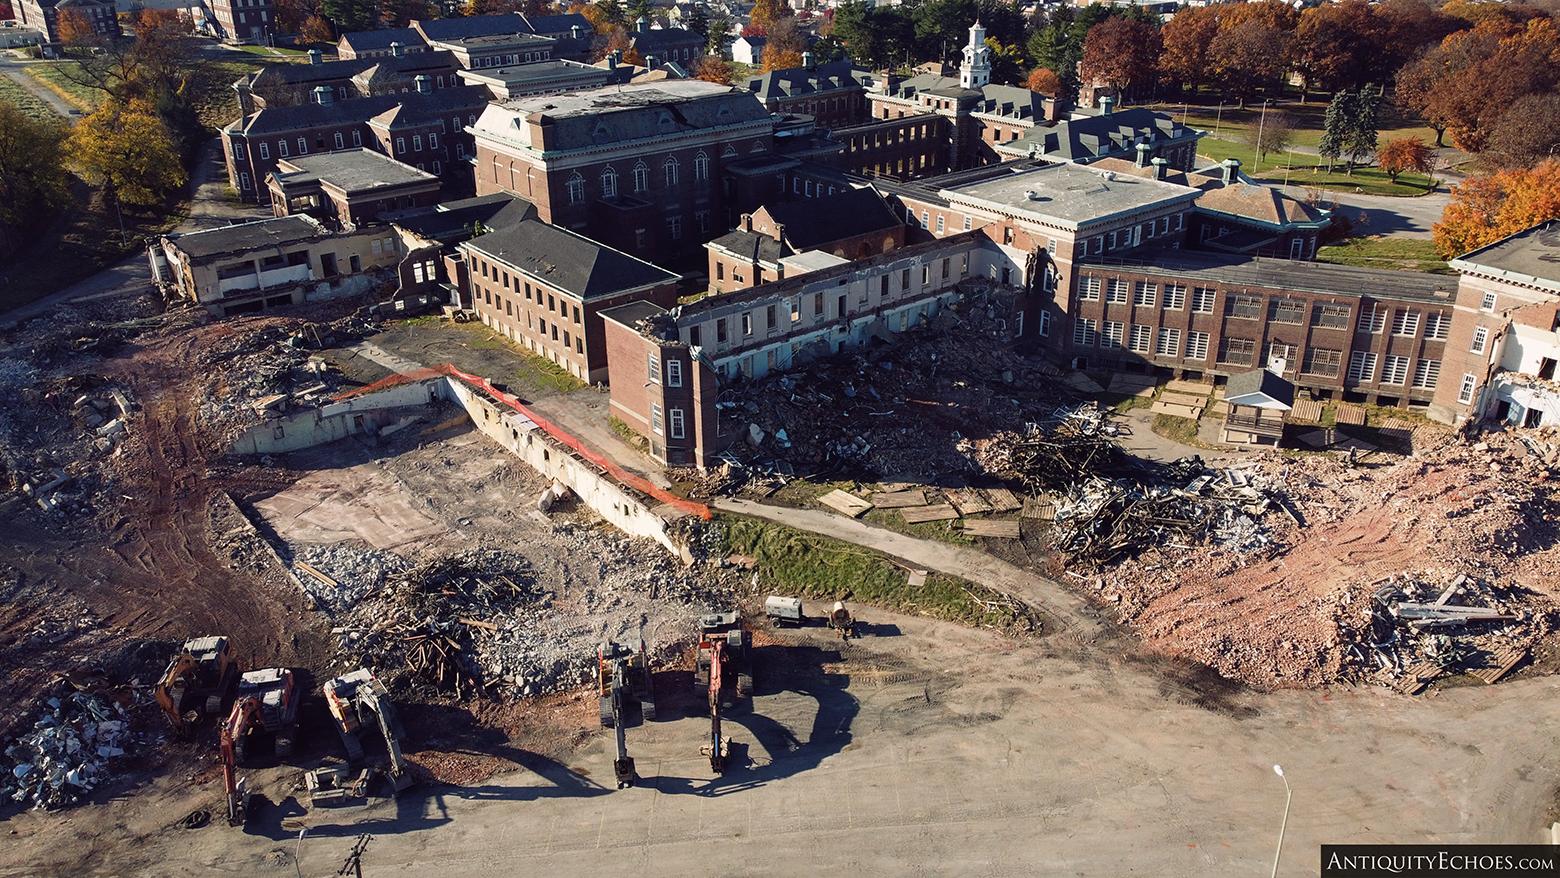 Allentown State Hospital - Demolition Begins